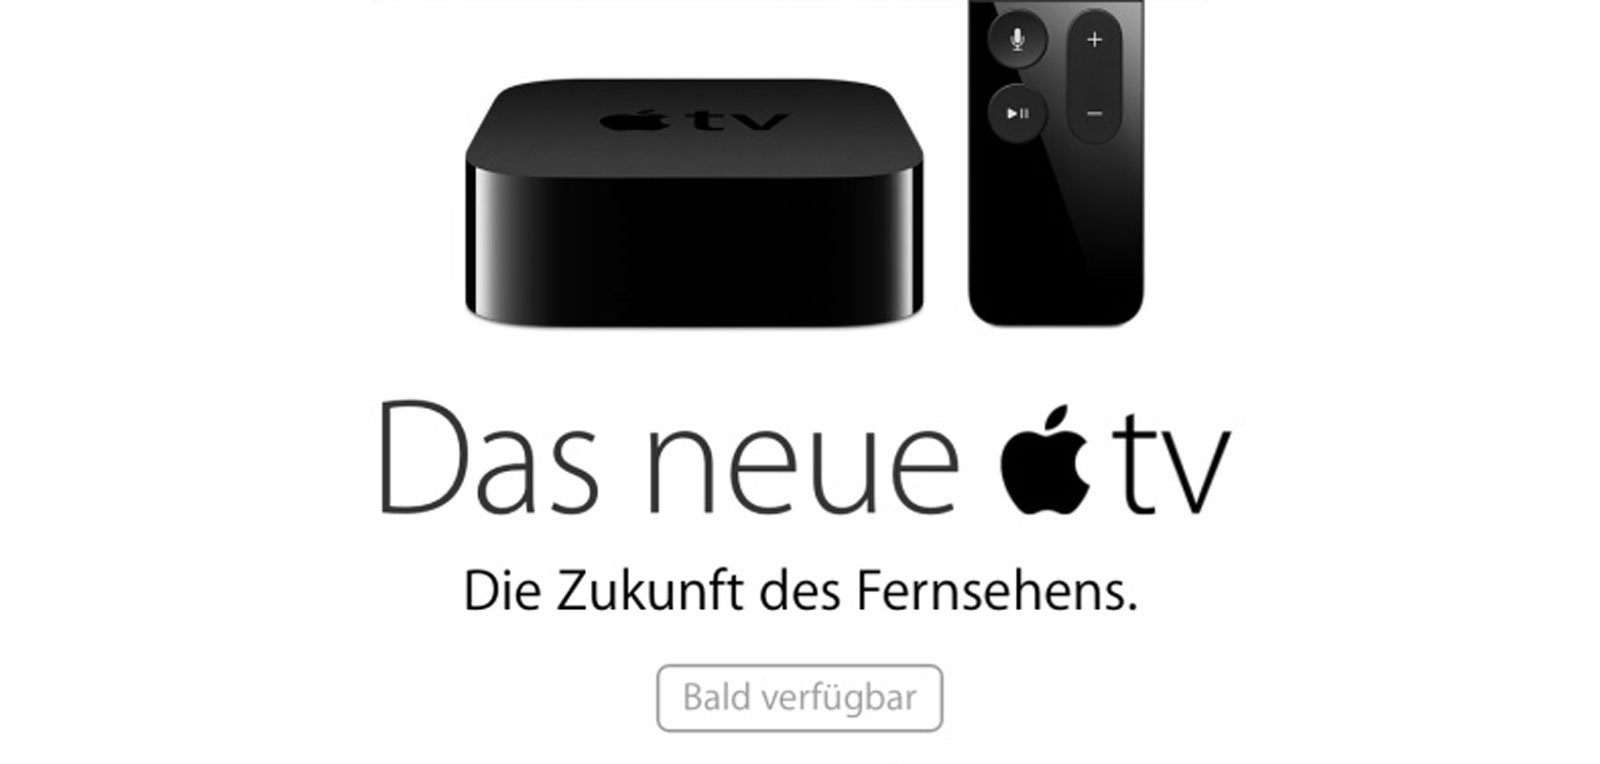 Apple TV 4: Remote-App nicht kompatibel 7